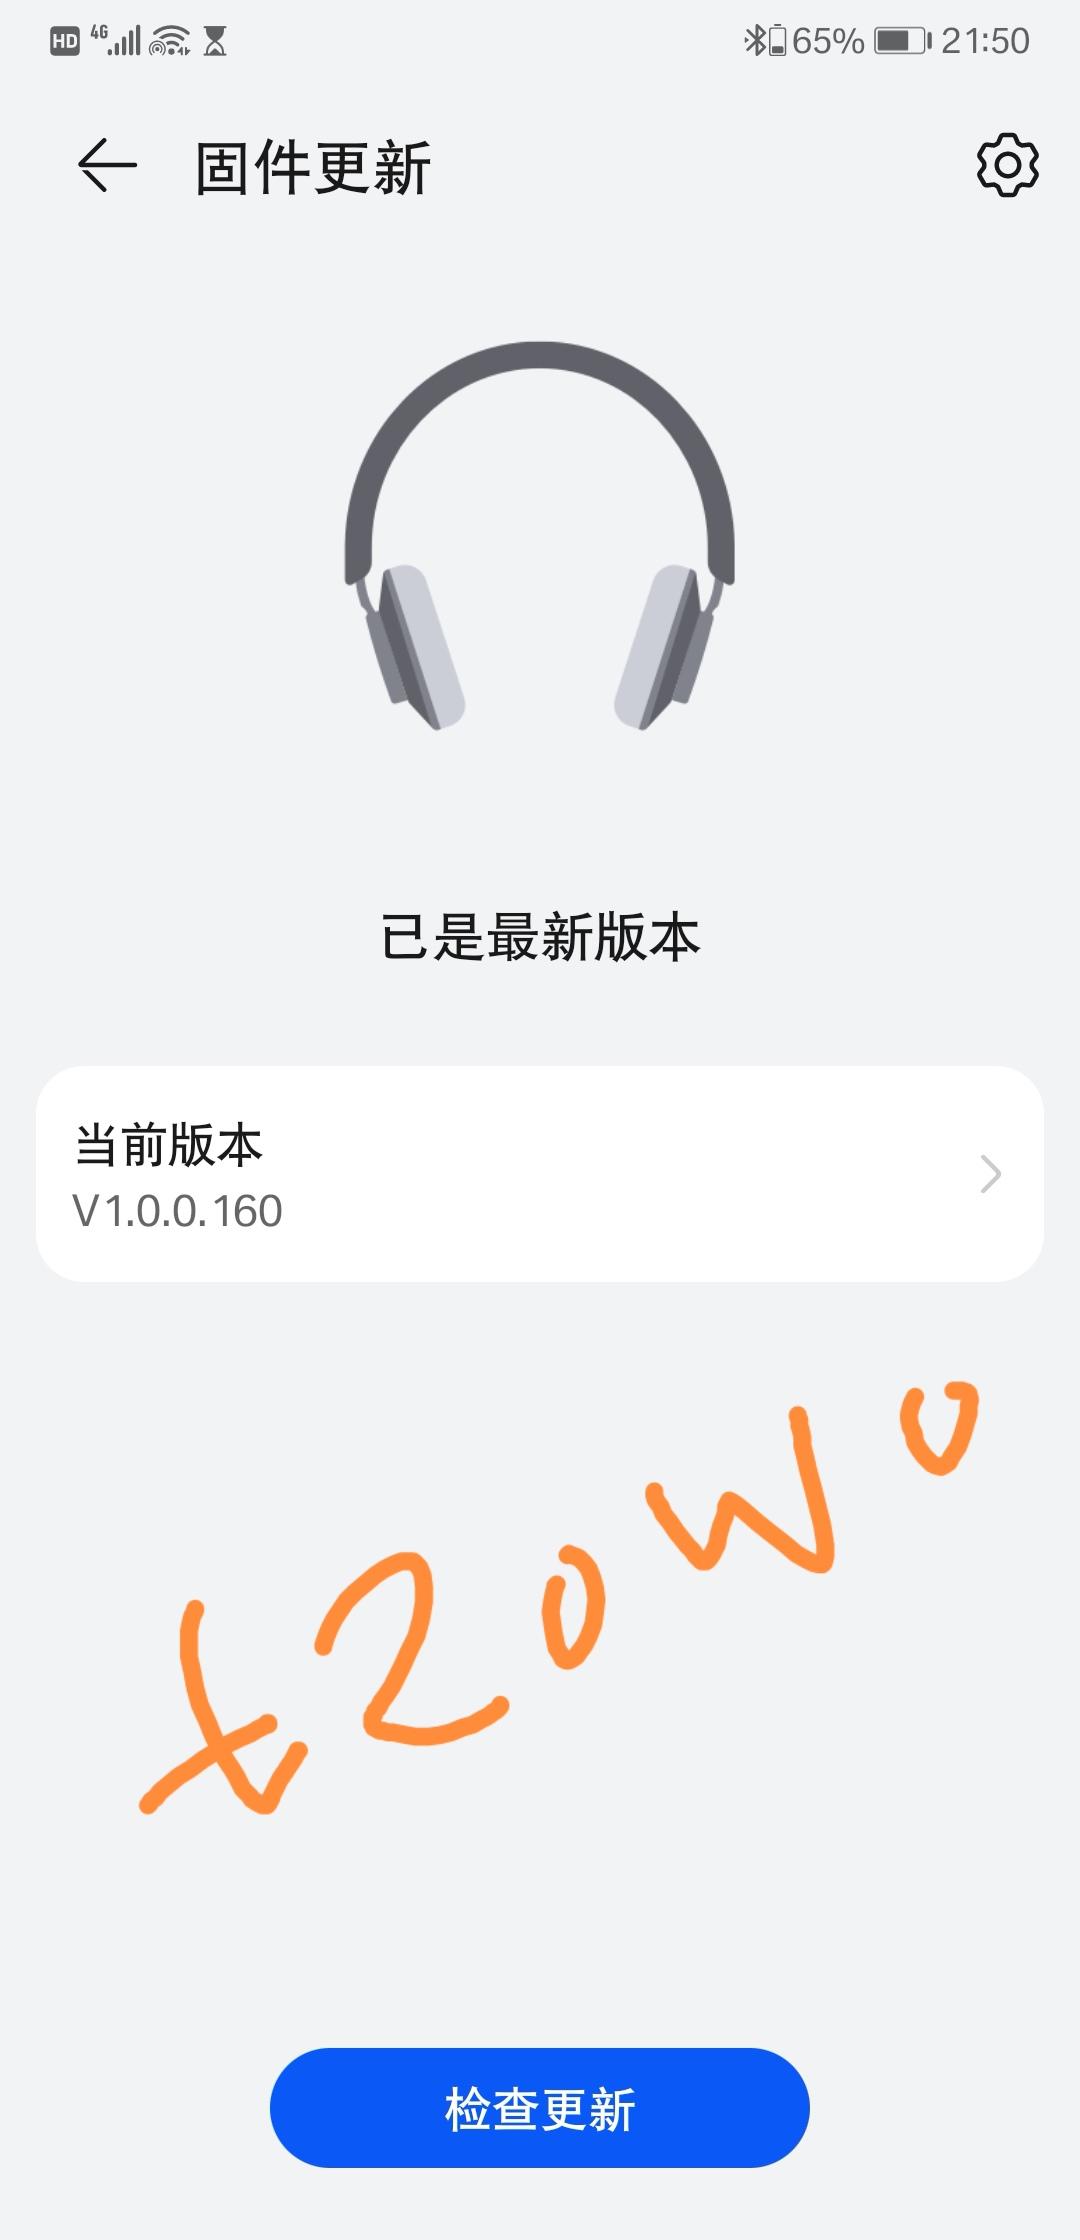 Screenshot_20210624_215005_com.huawei.smarthome_edit_52956174400773.jpg